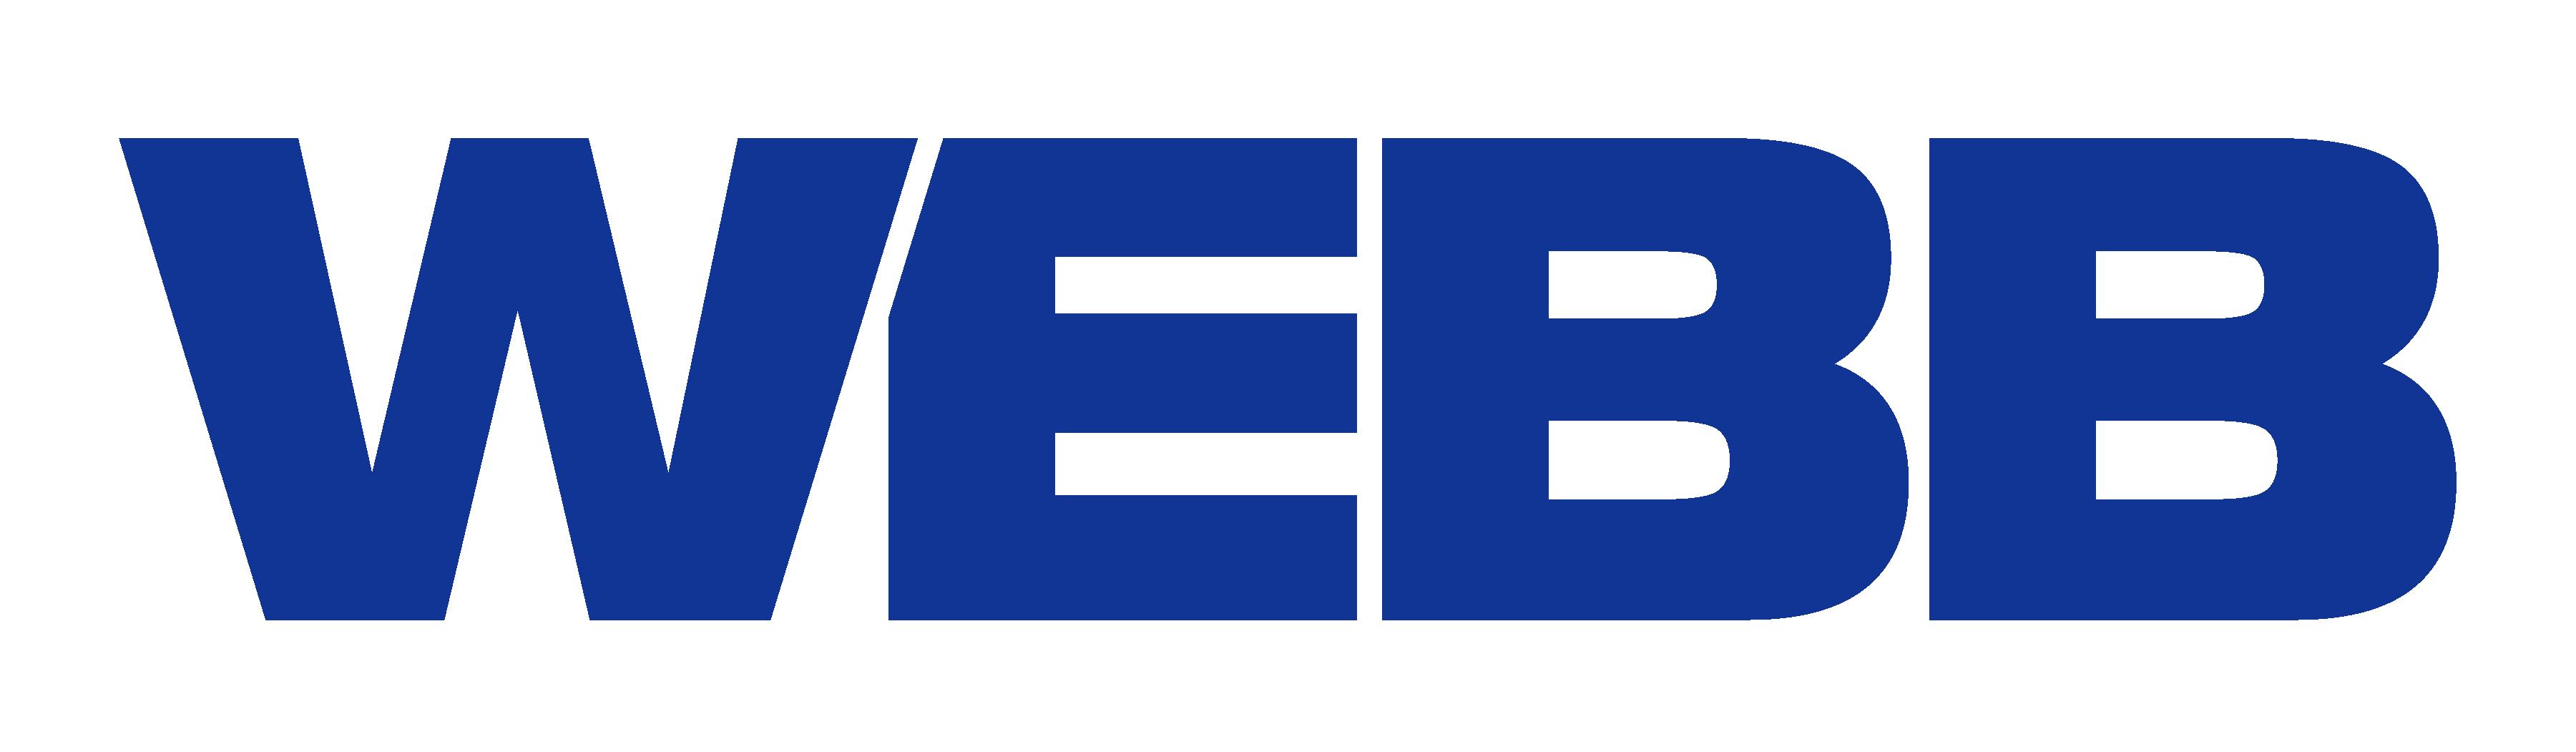 Webb Auto Group